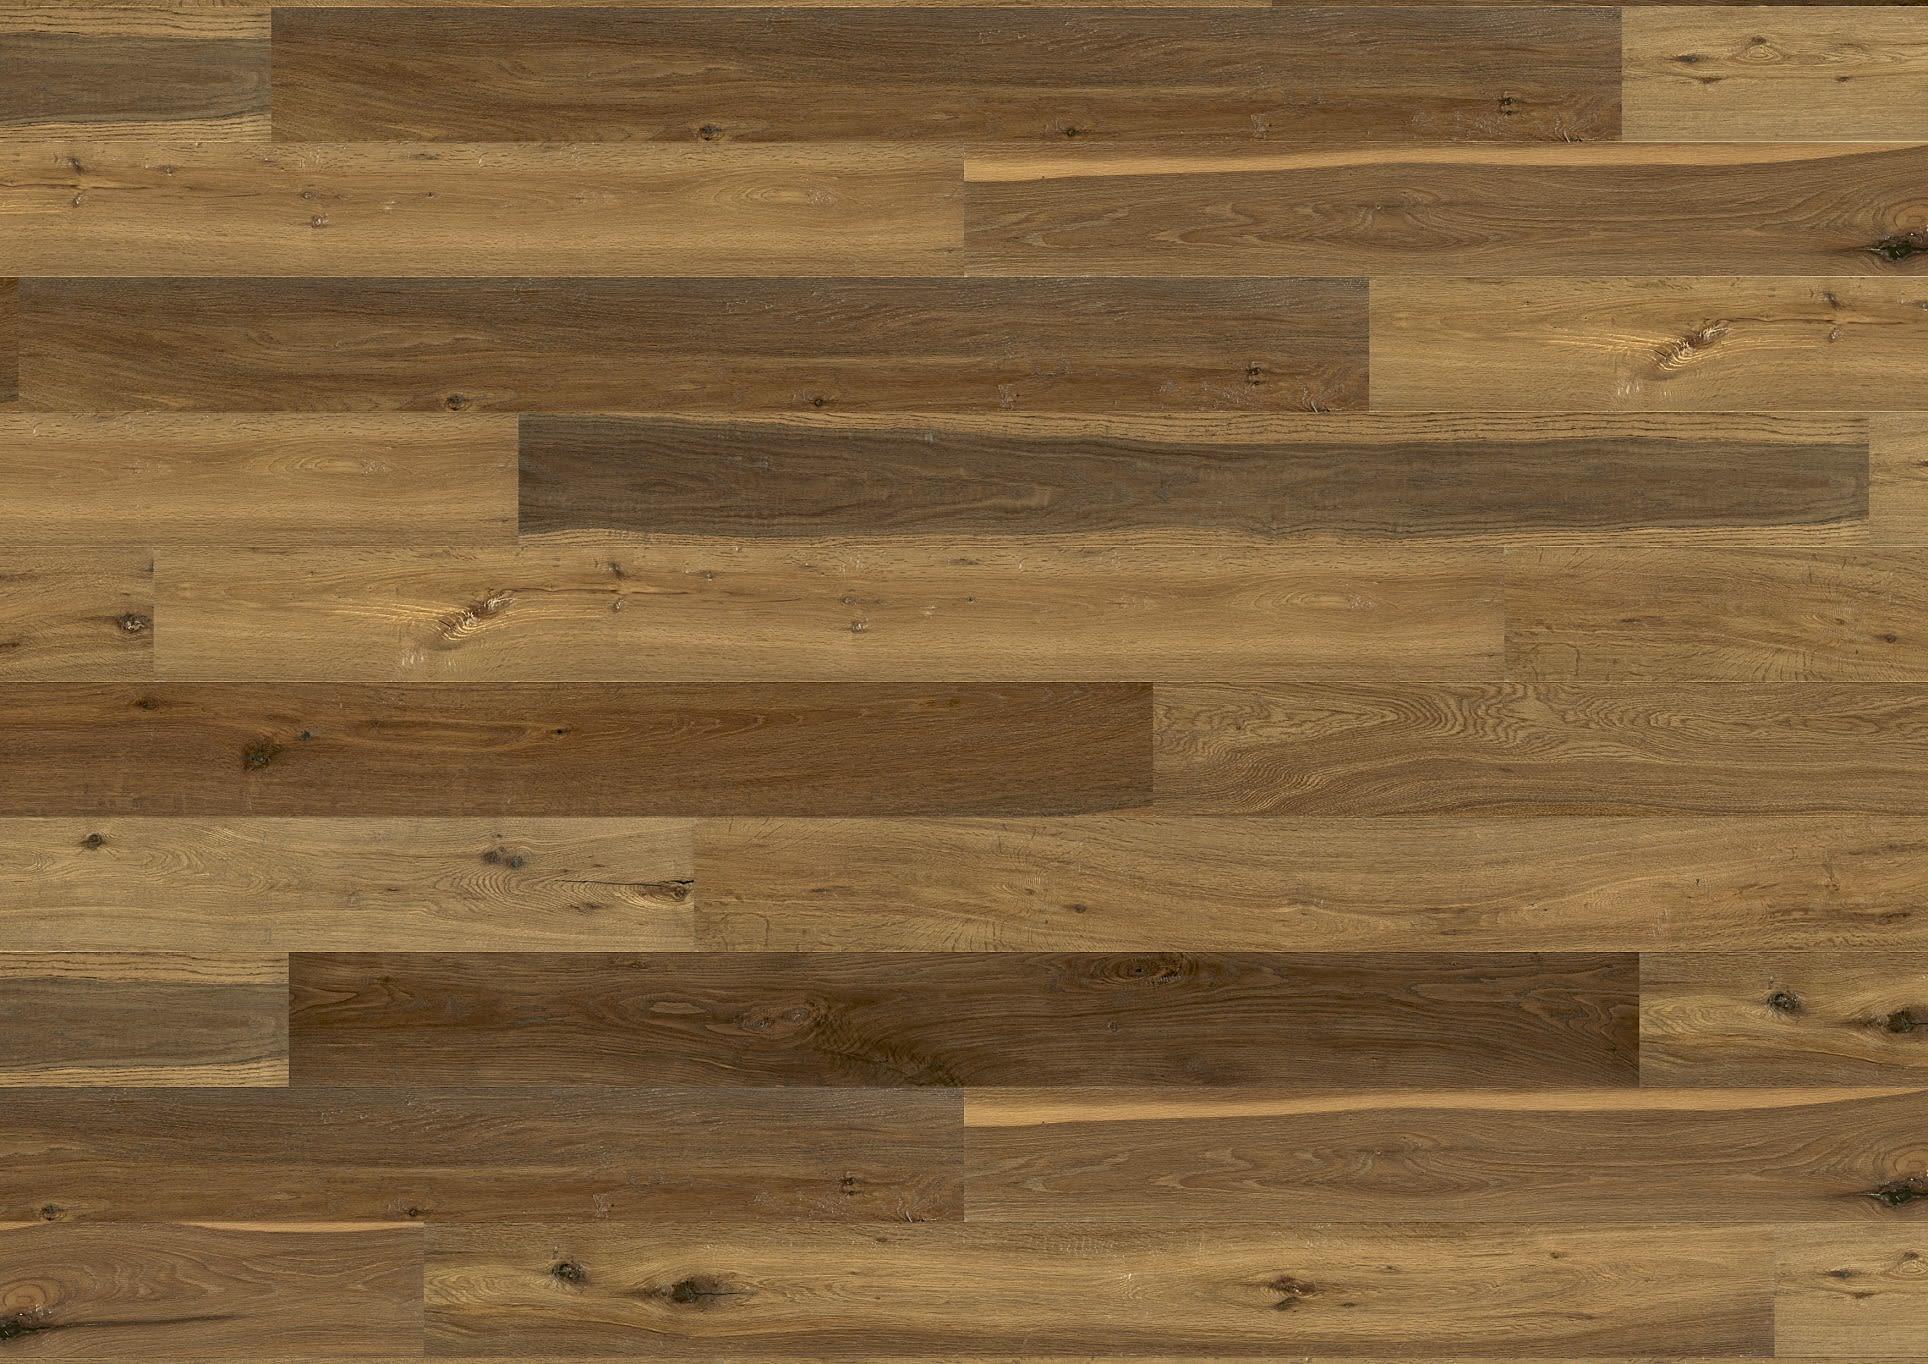 Maine Smoked Oak Rustic Heavy Brushed, Maine Wood Flooring